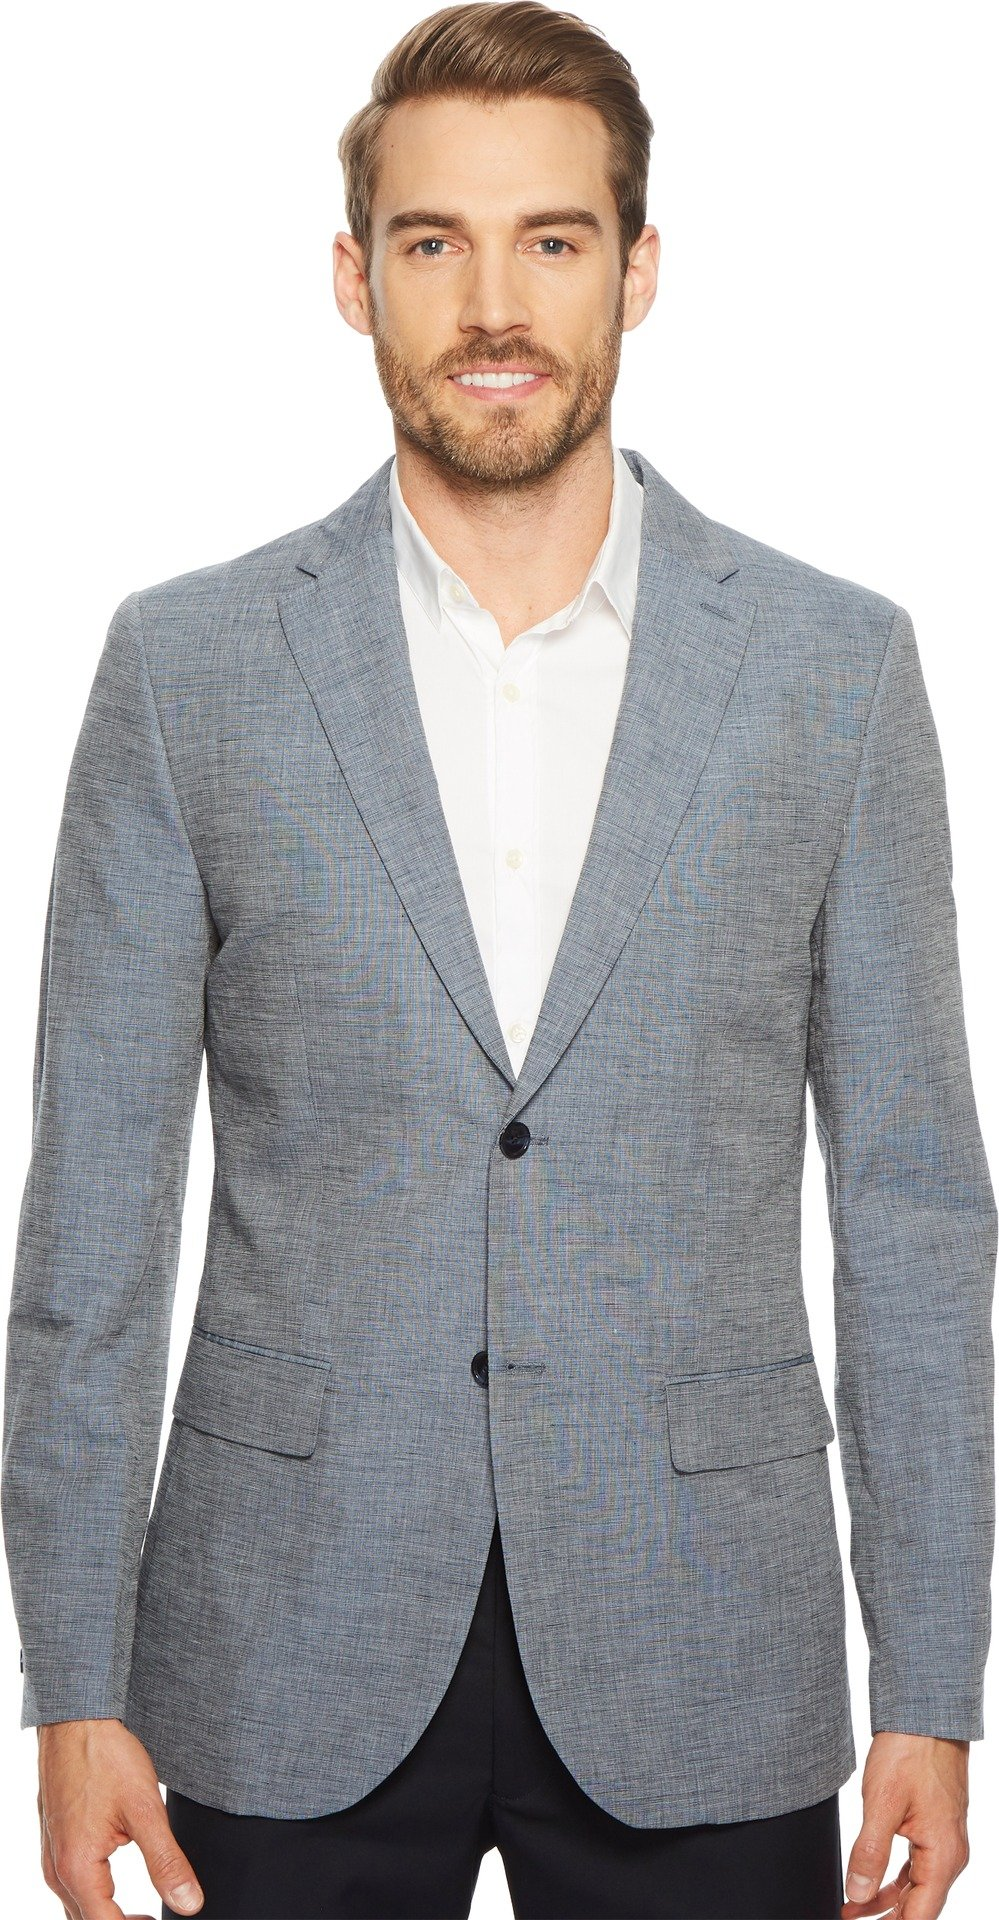 Perry Ellis Mens Slim Fit End-On-End Linen Suit Jacket Bijou Blue 2XL (46 Regular) One Size by Perry Ellis